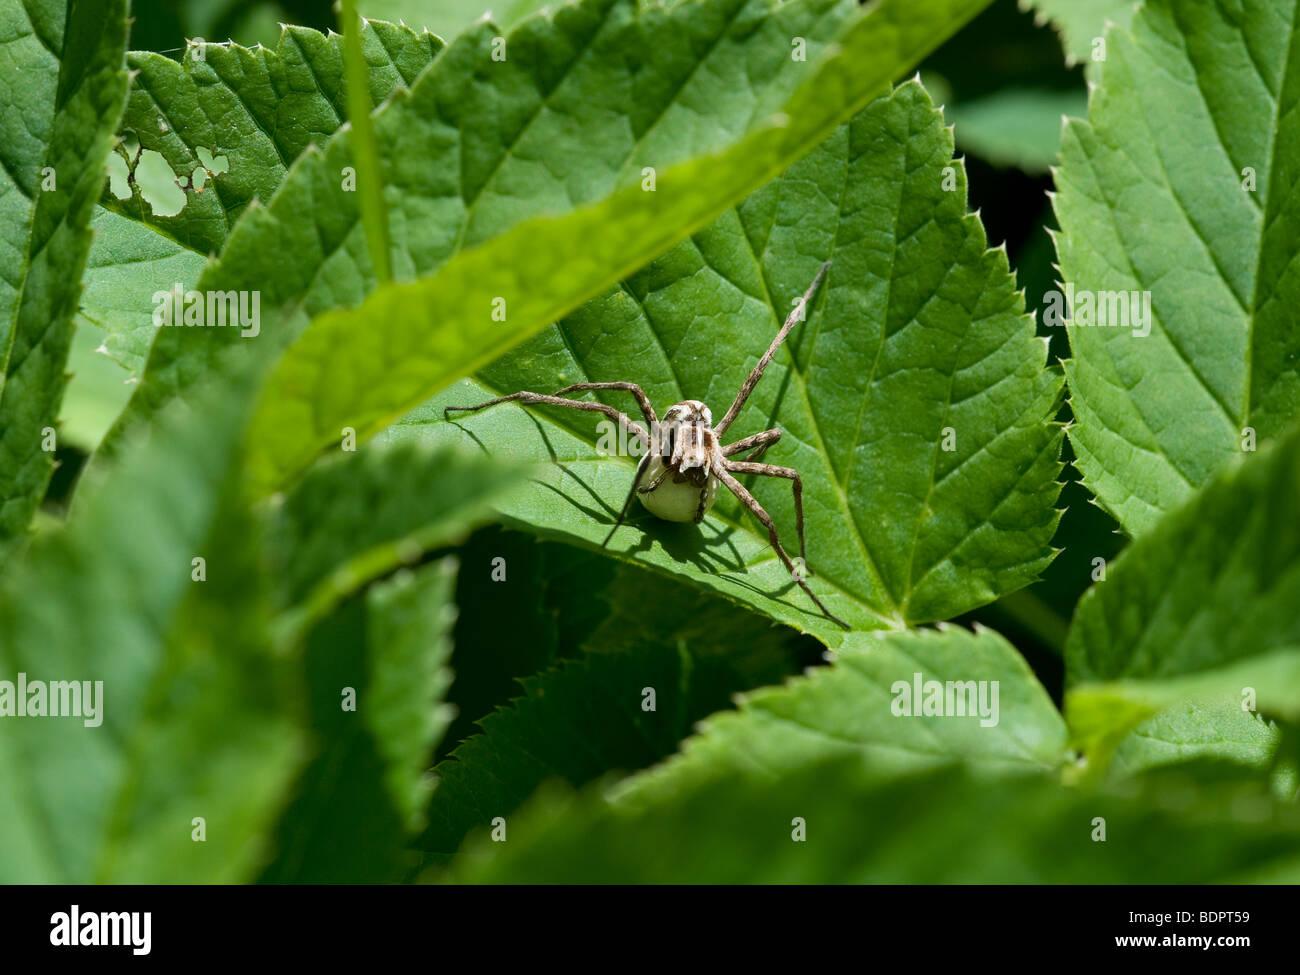 Araneae - Stock Image